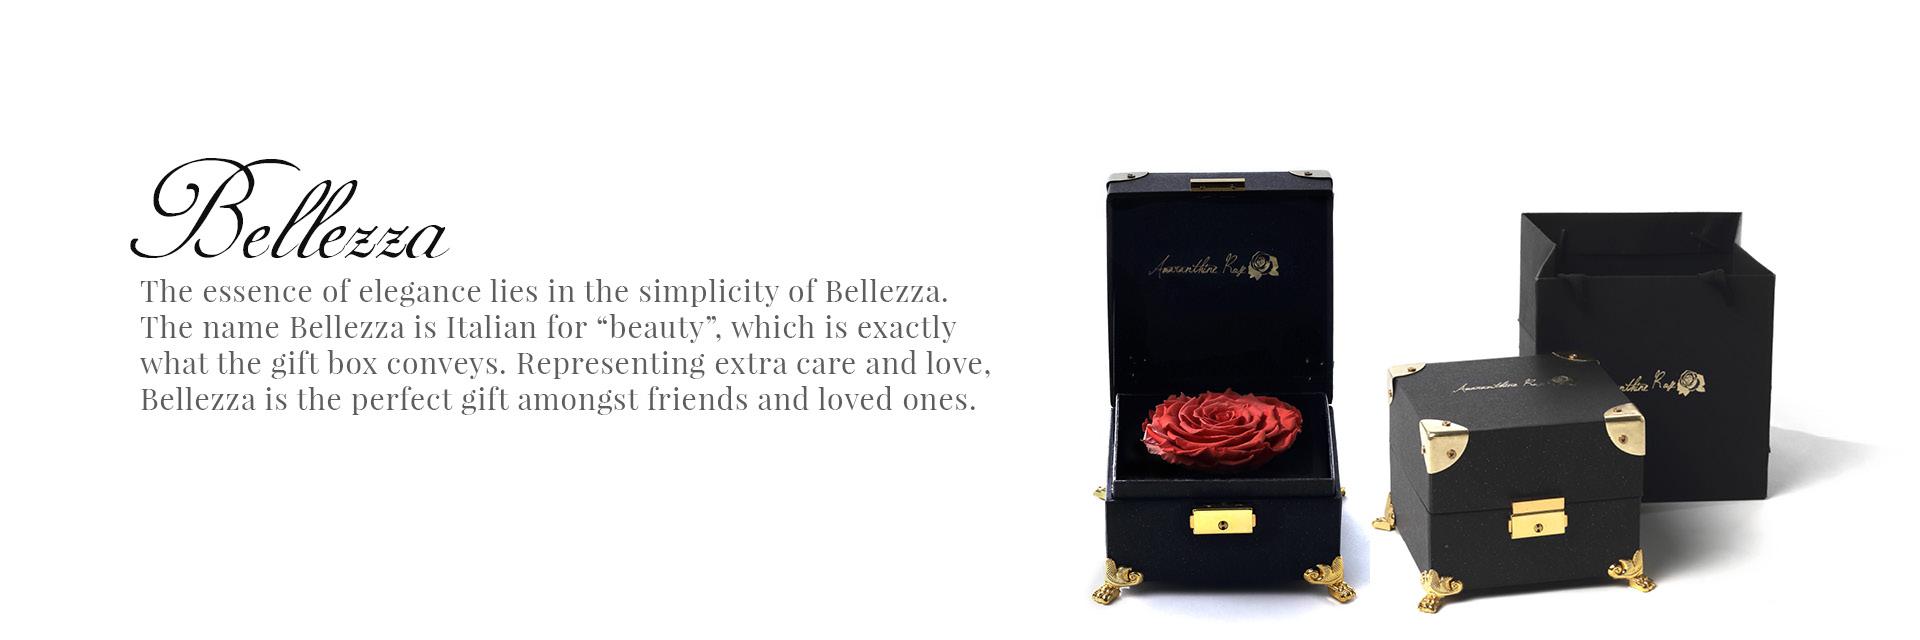 BellezzaCategory